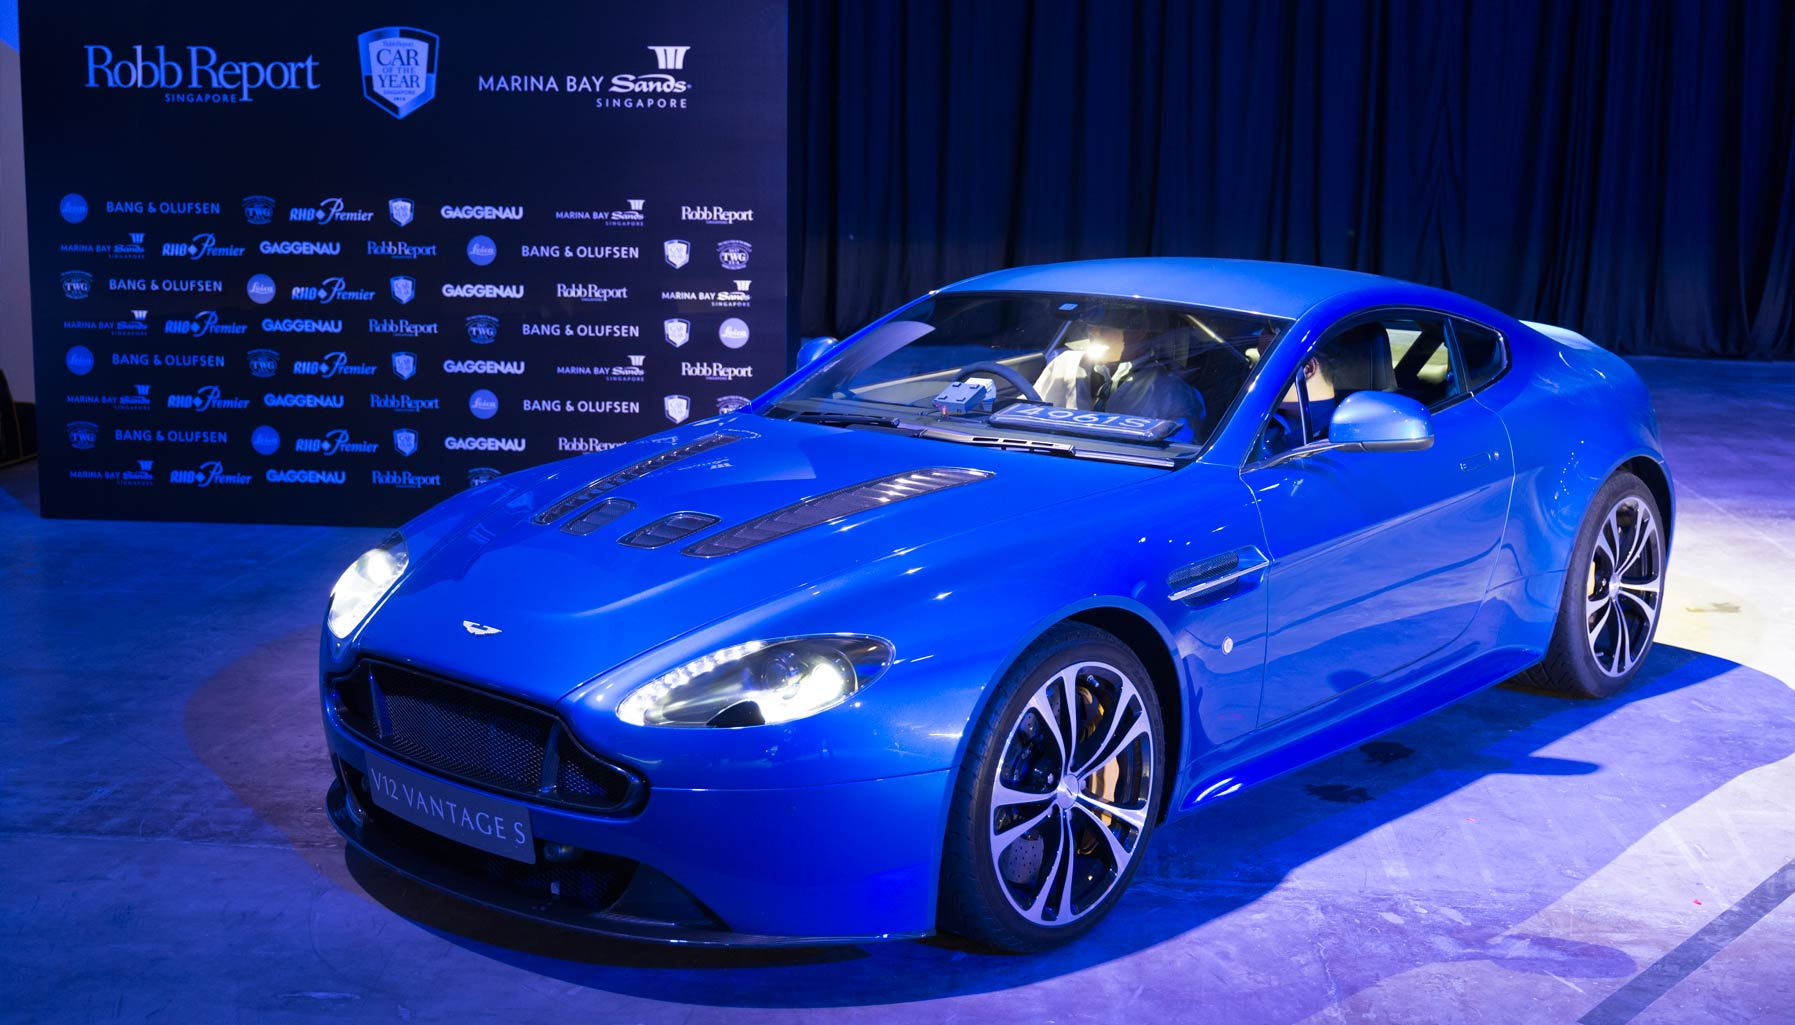 COTY 2016 contender: Aston Martin V12 Vantage